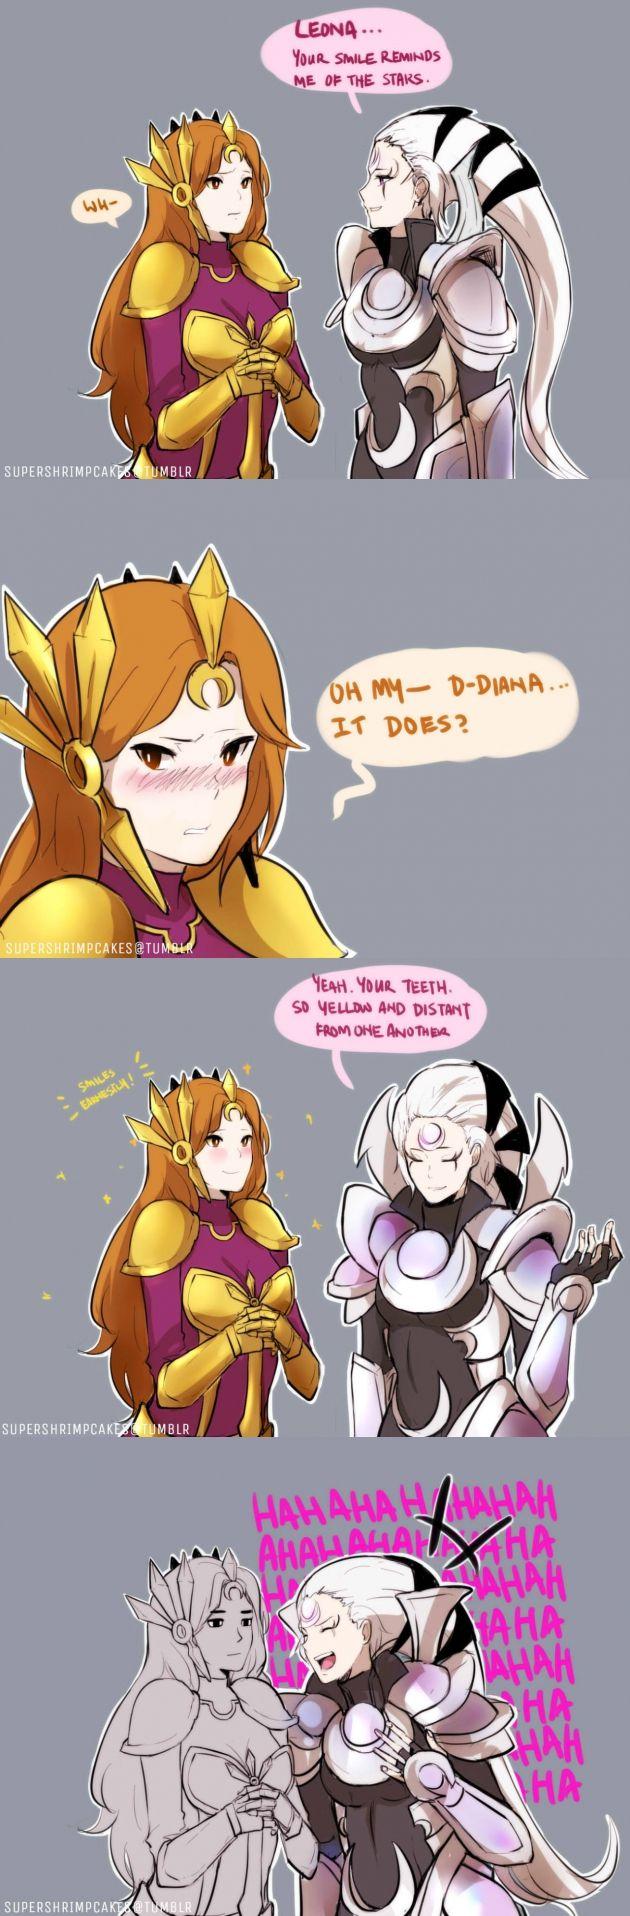 Leona With Diana  League Of Legends  League Of Legends -6368